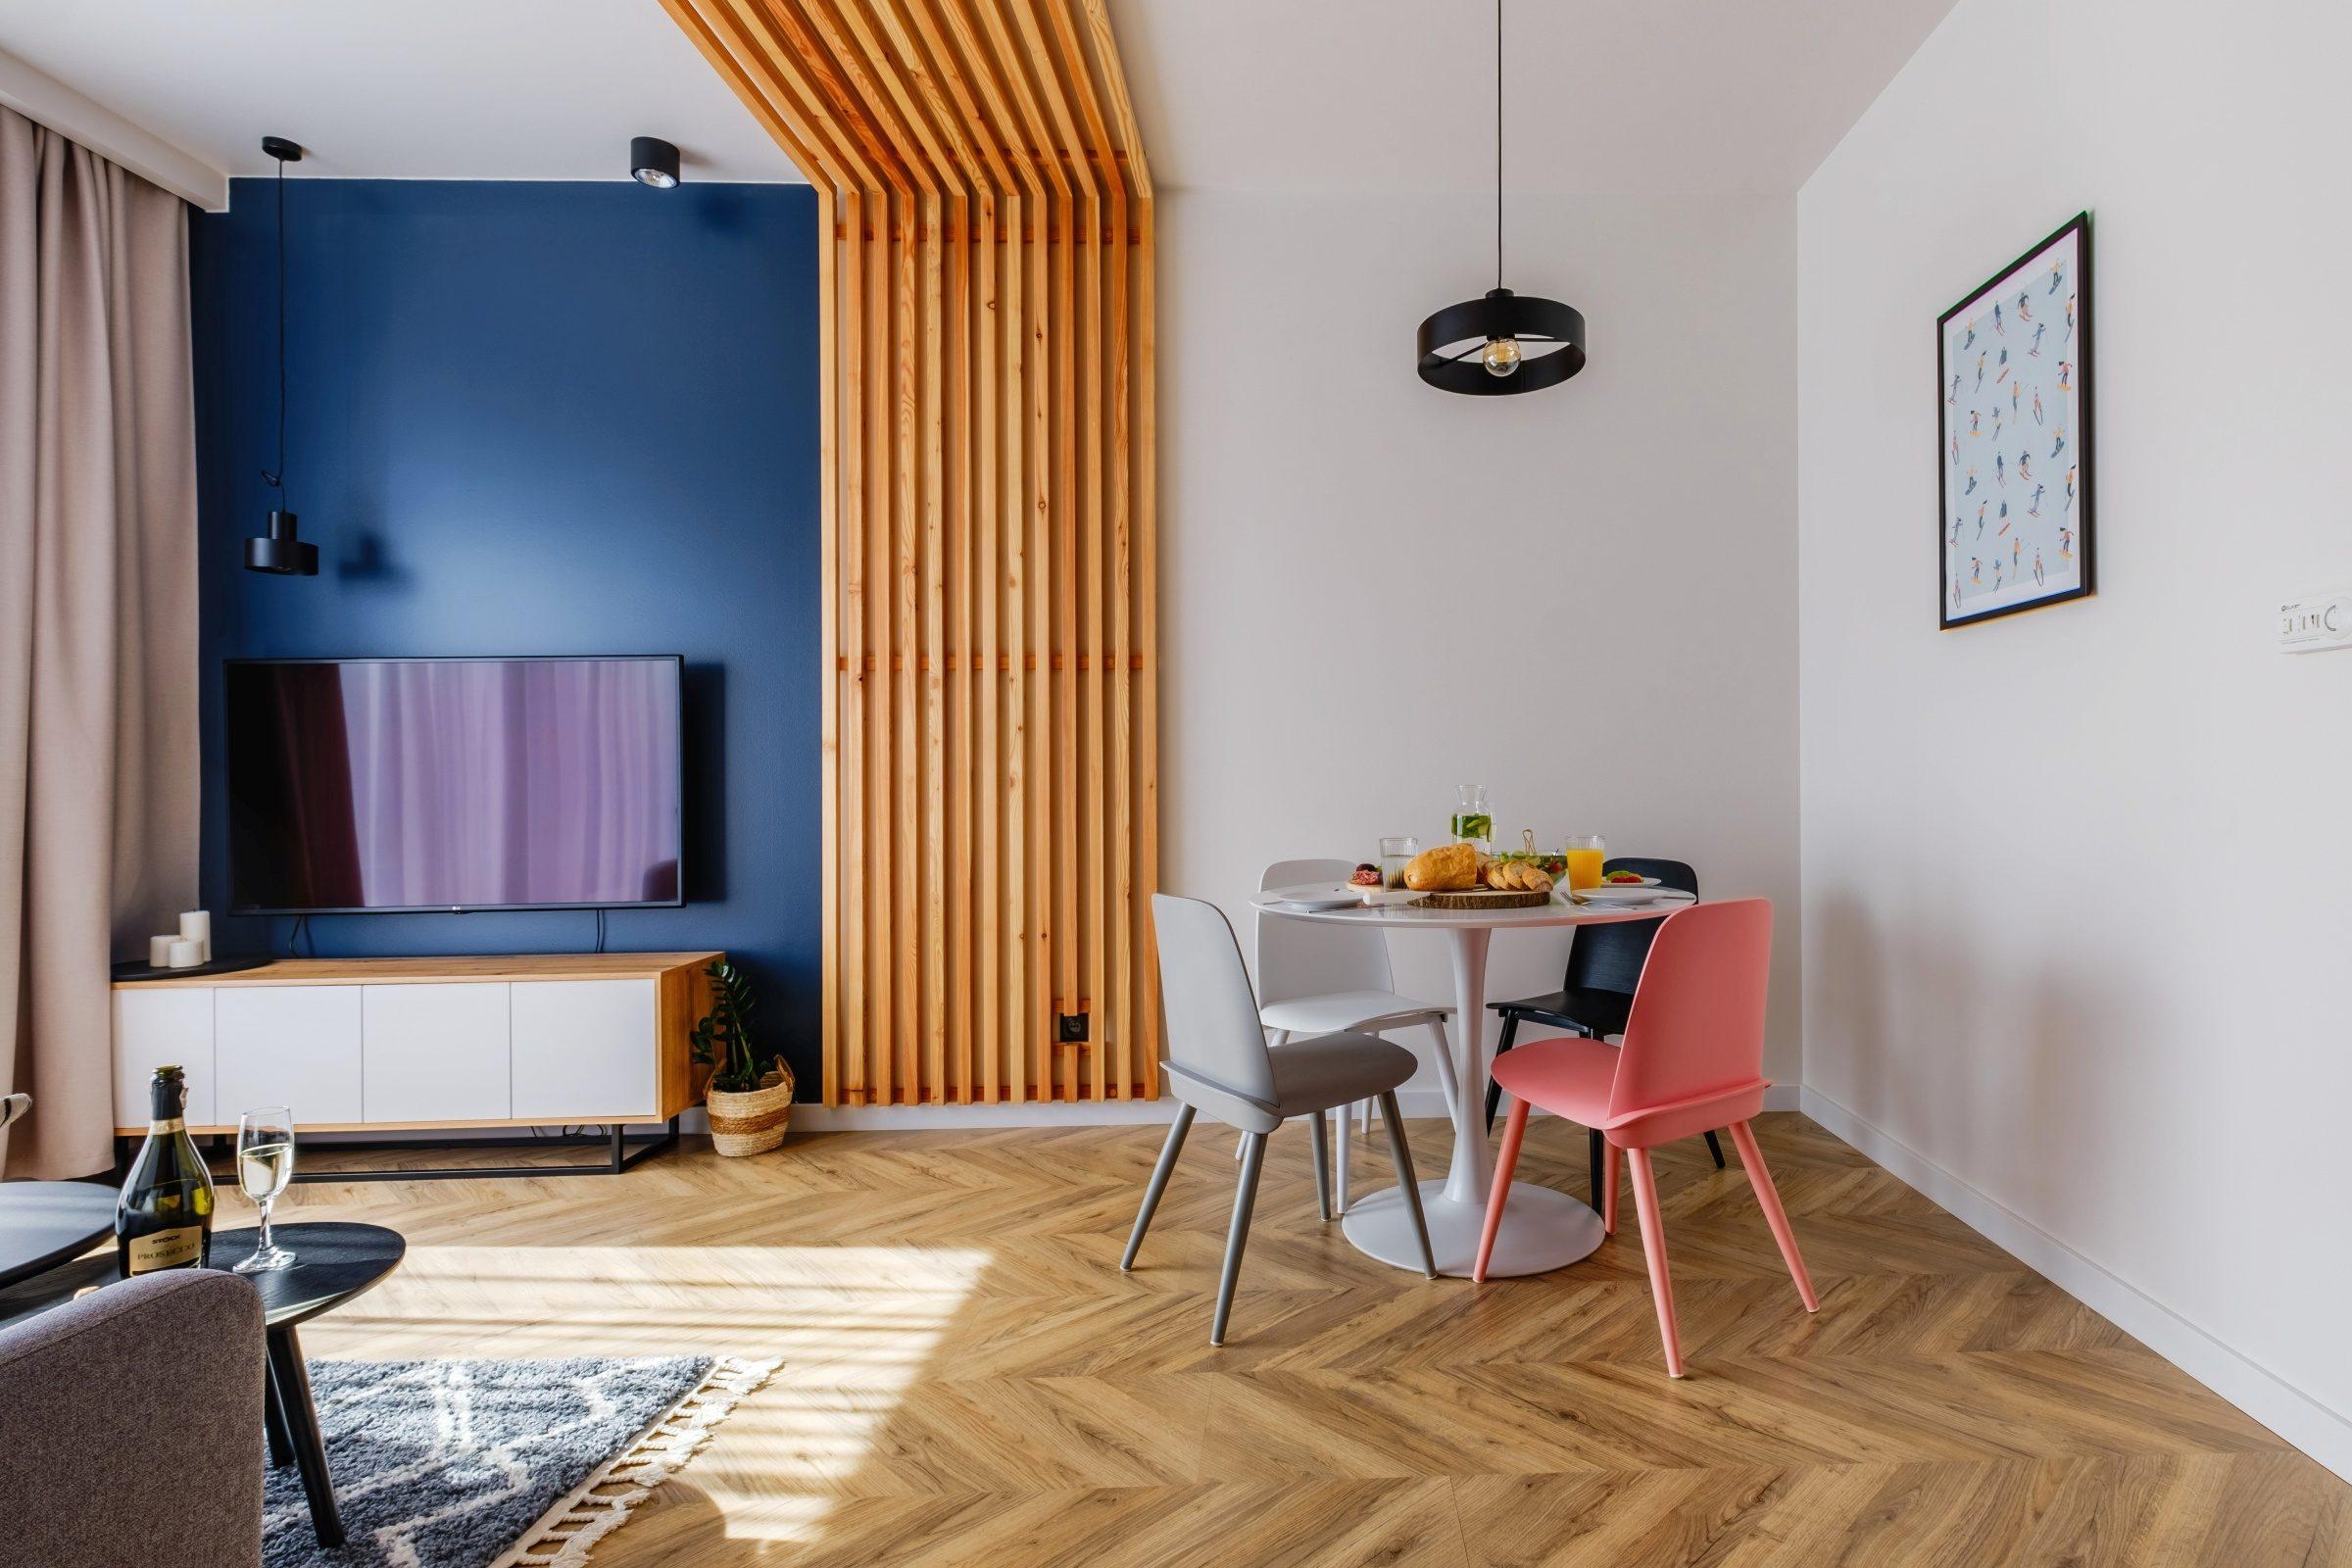 Apartamenty NOVA BIAŁKA Białka Tatrzańska apartament 6 salon 3